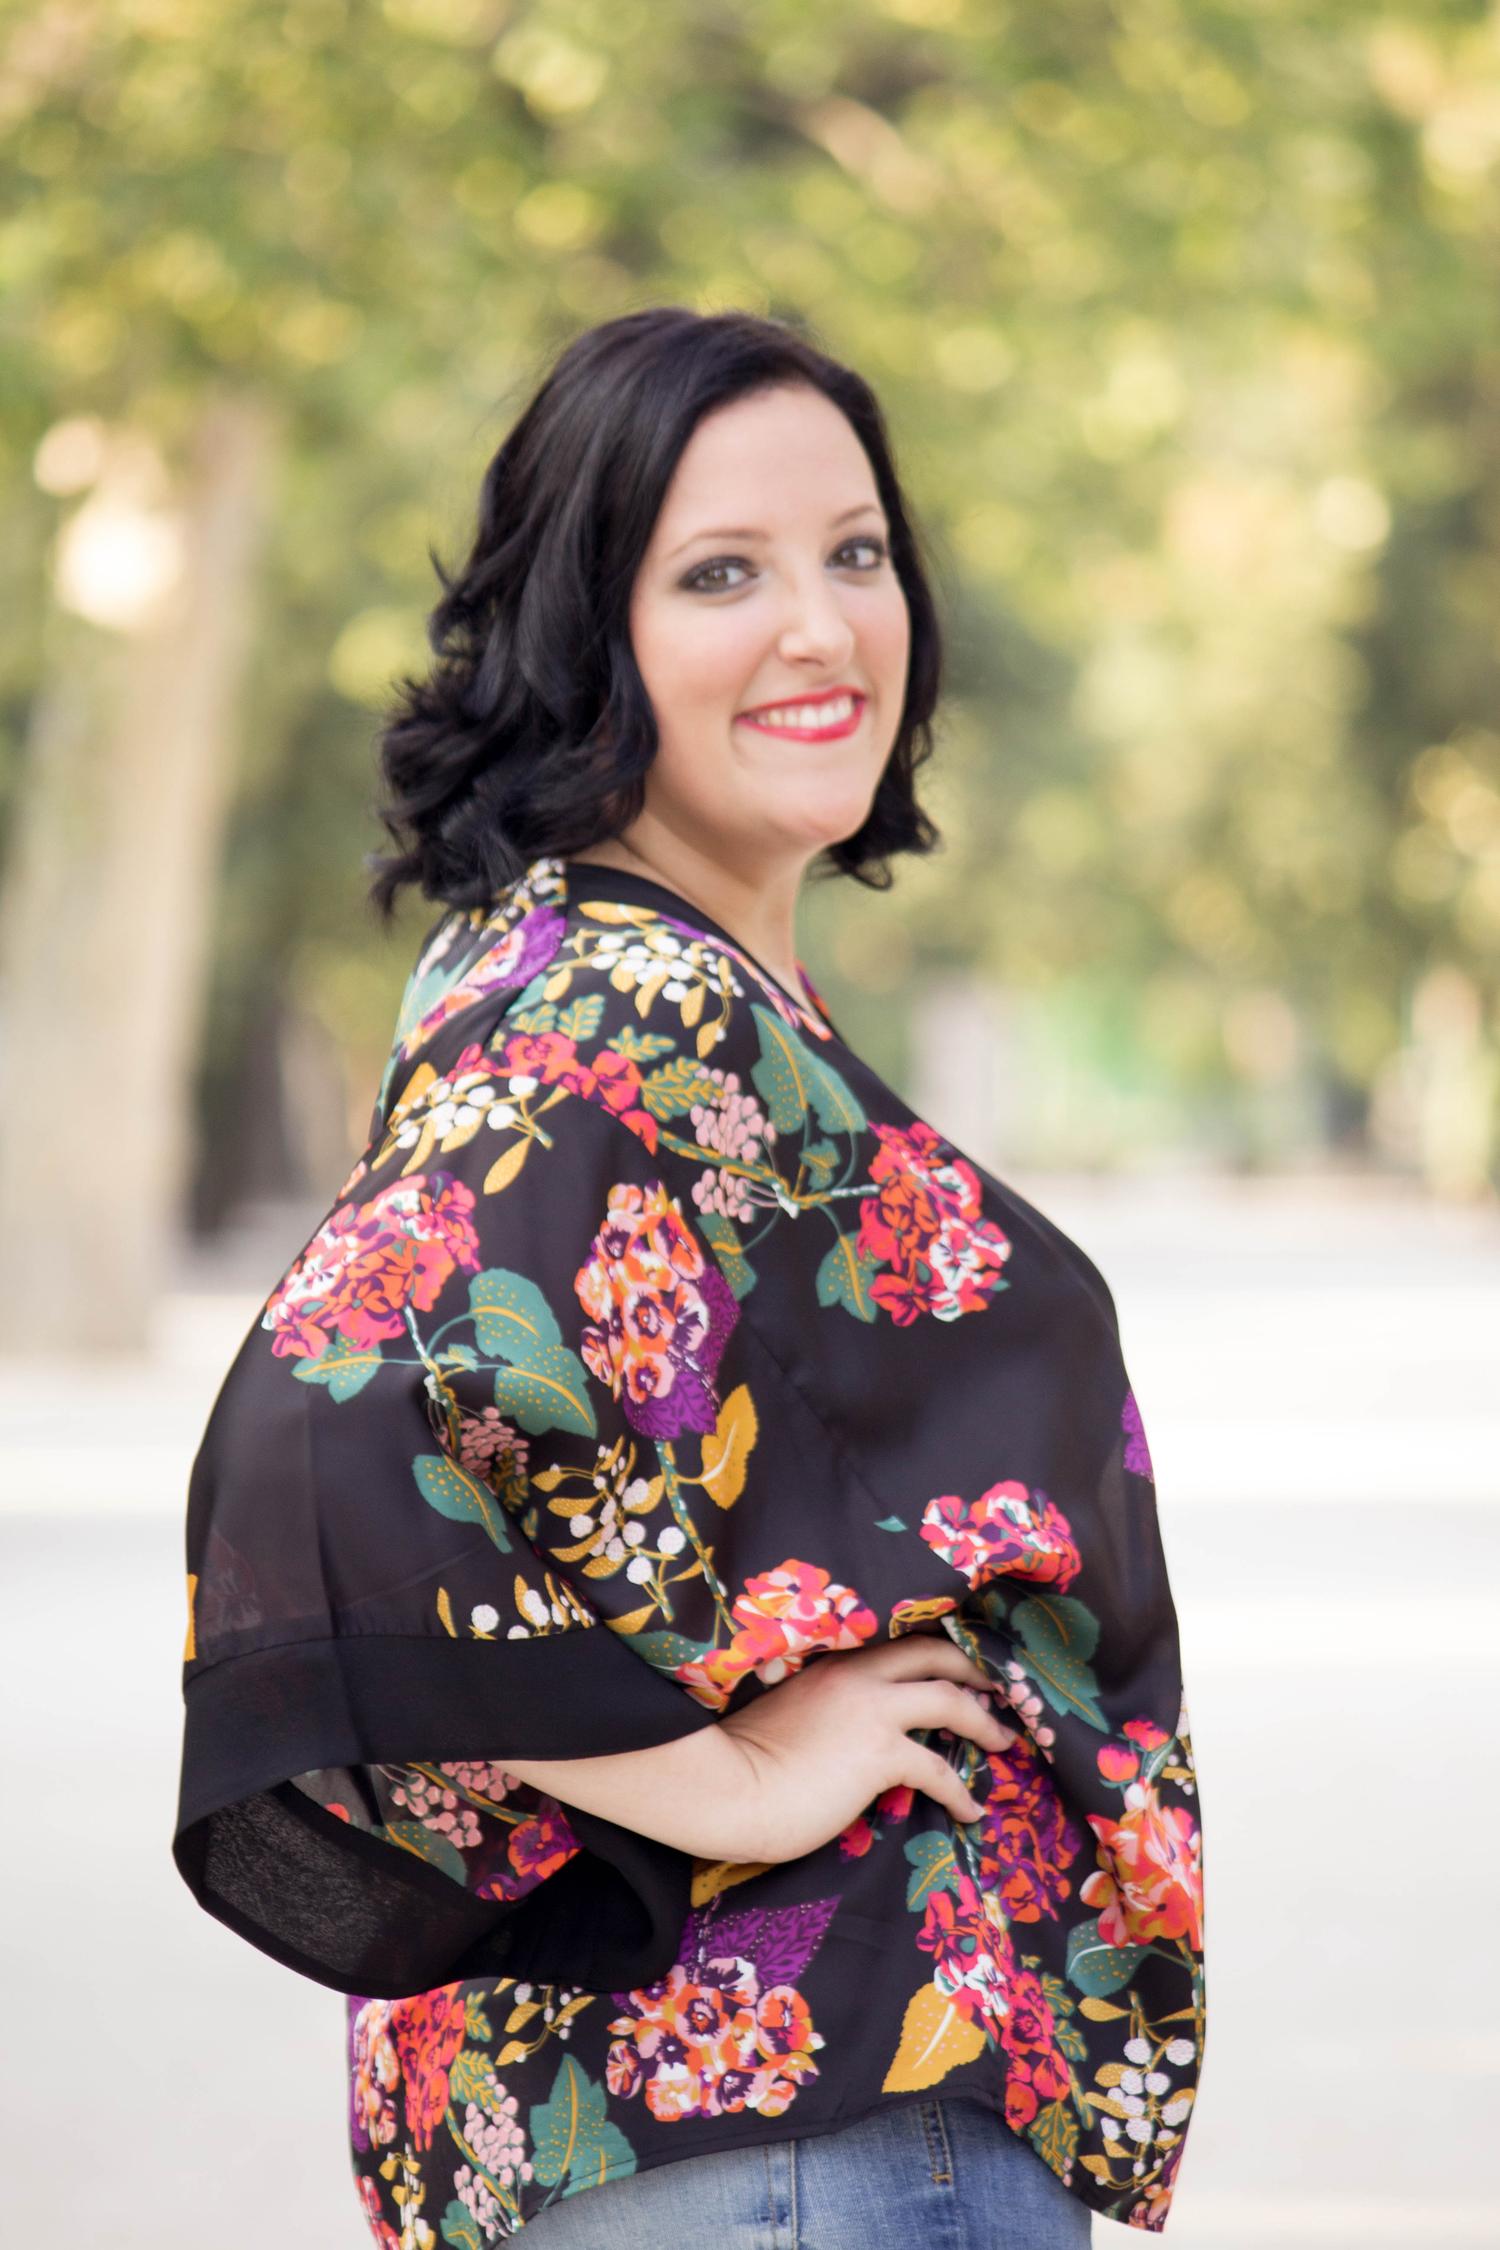 En la sesión de fotos con kimono de H&M